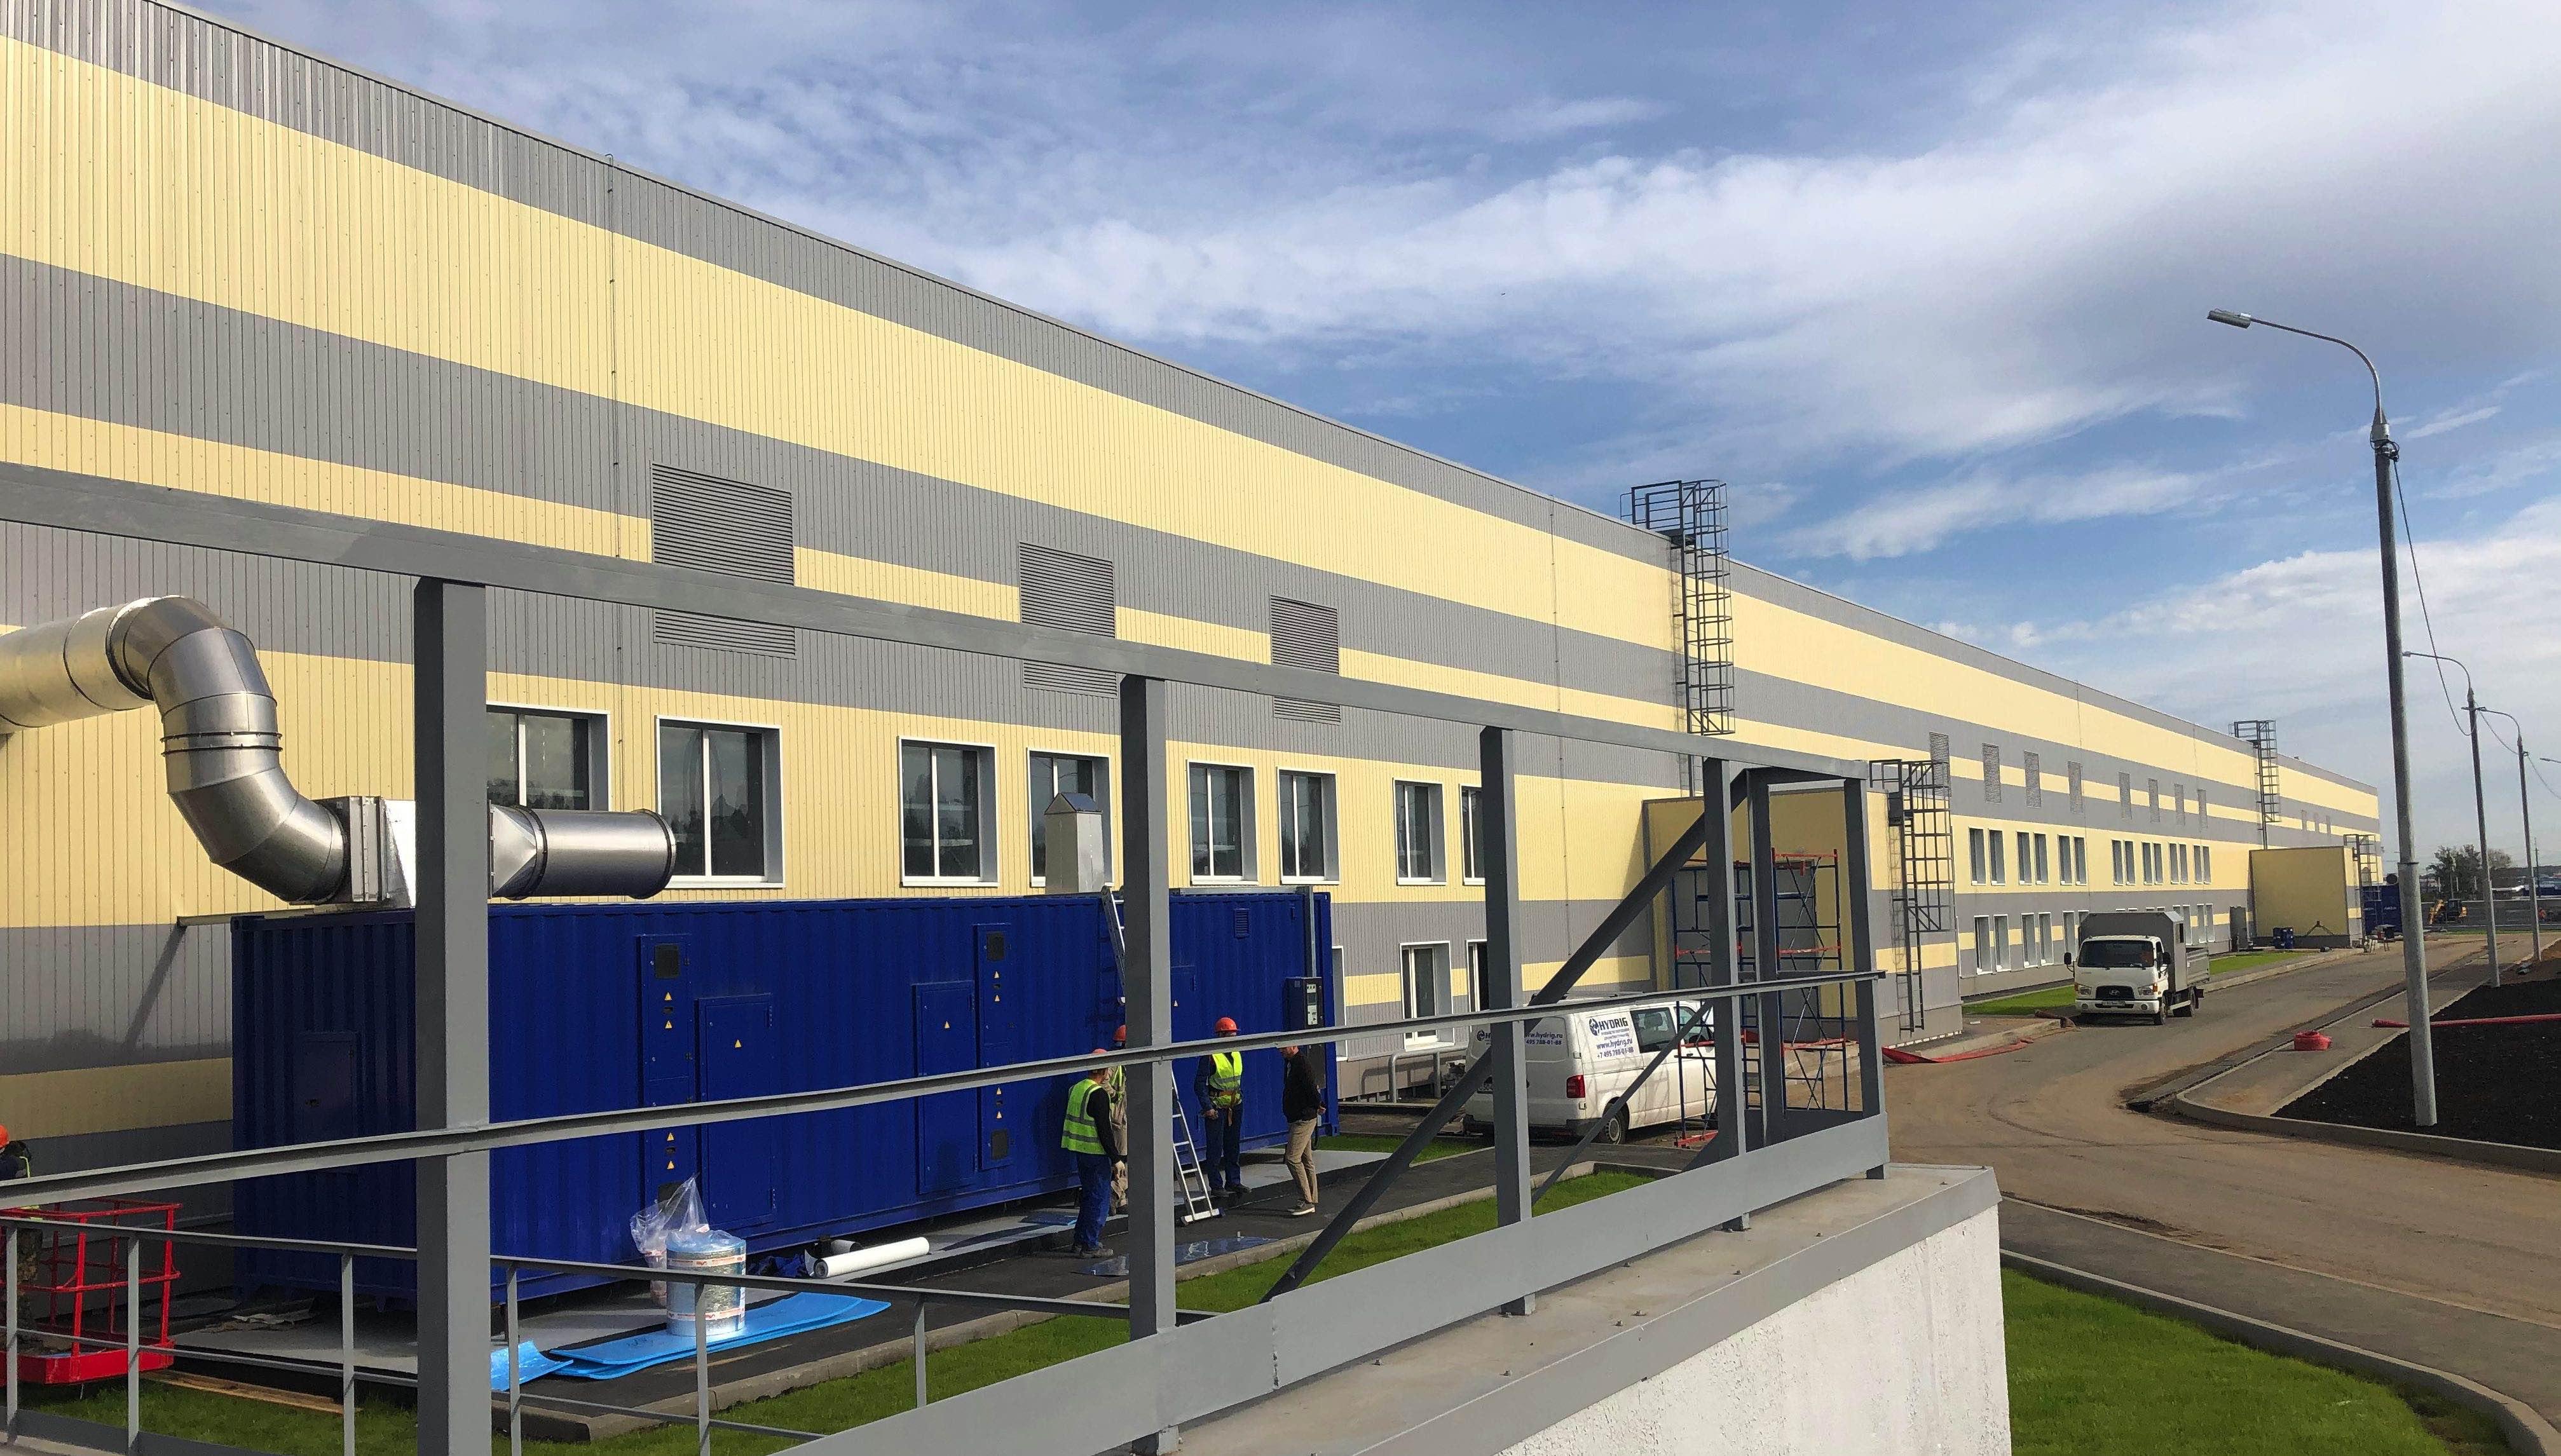 Вакансии избердеевский элеватор генри форд конвейер конкуренция